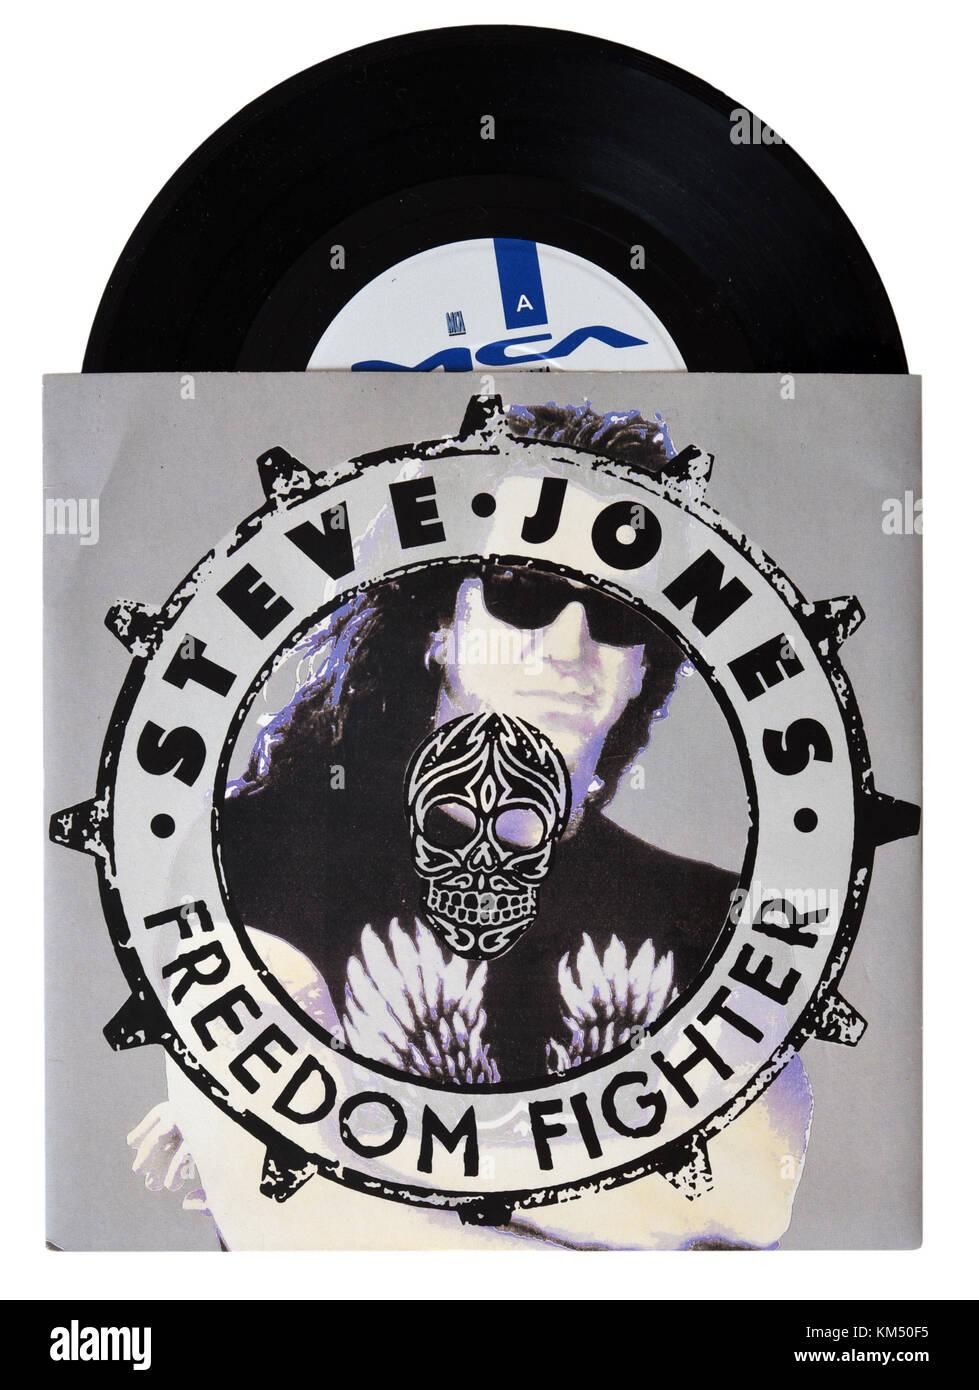 Steve Jones Freedom Fighter seven inch single - Stock Image